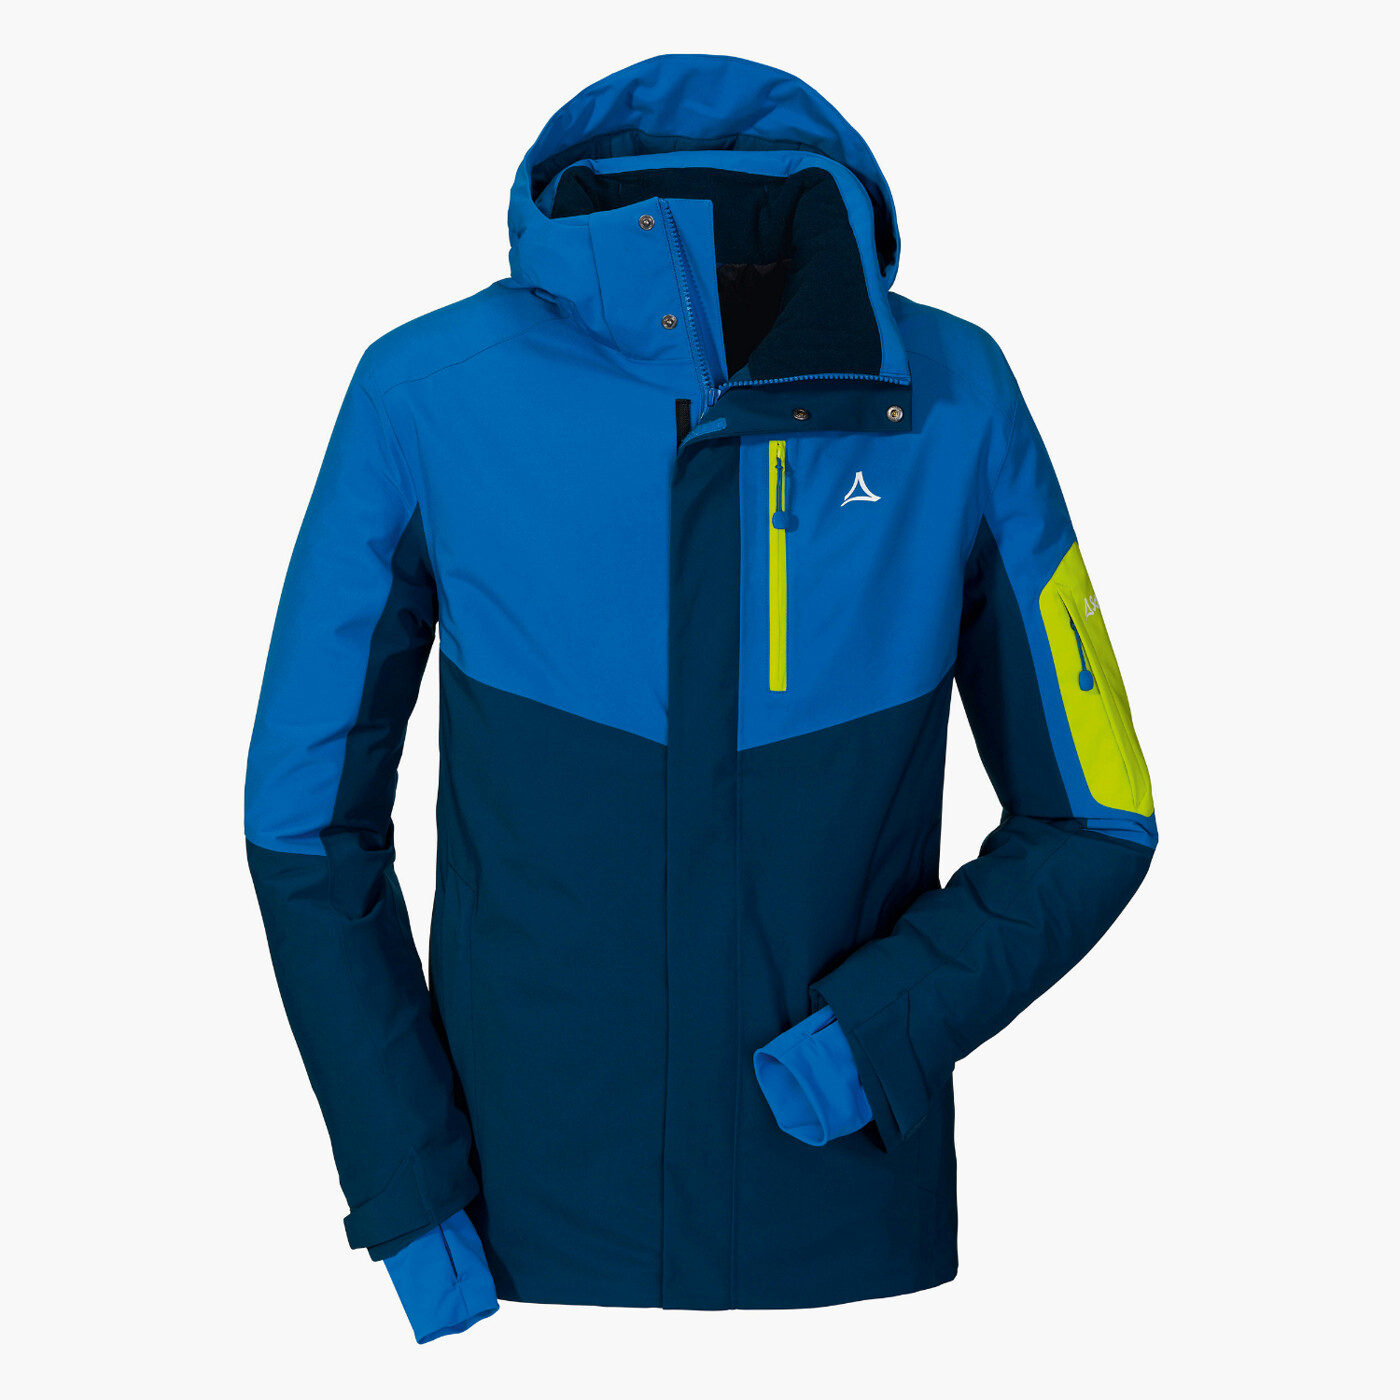 SCHÖFFEL Ski Jacket Bozen3 - Herren